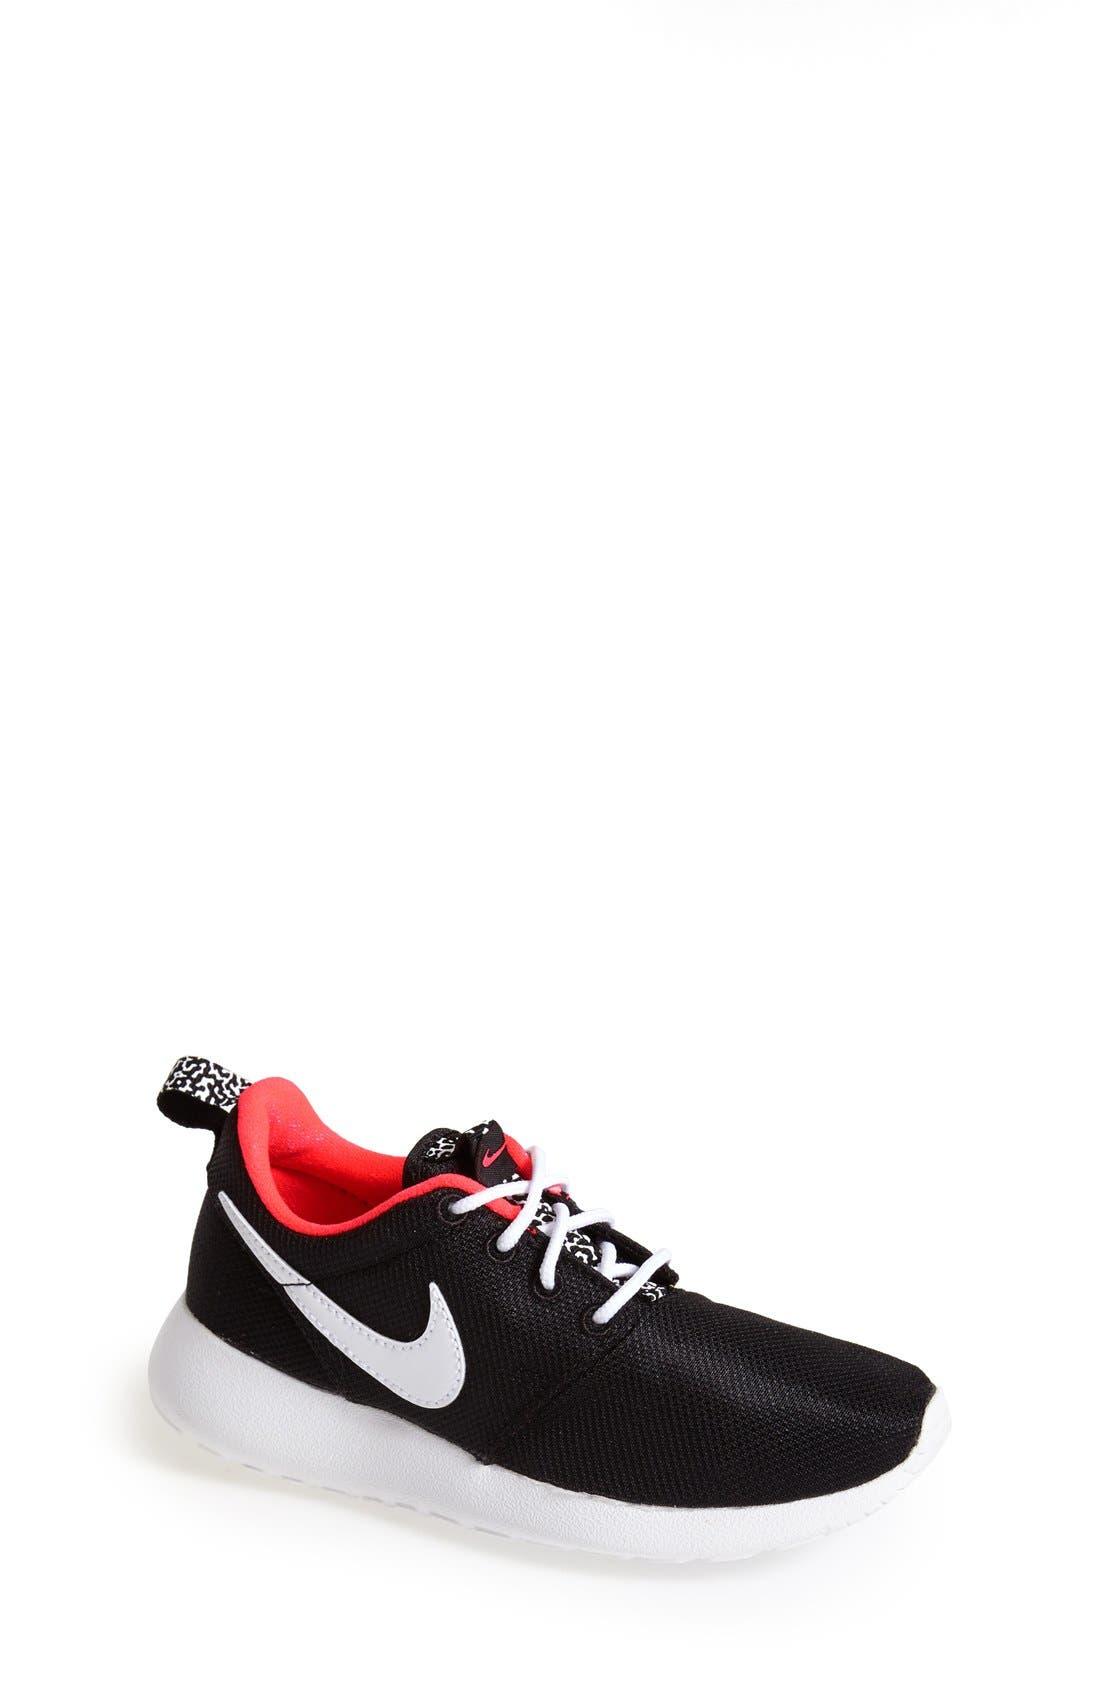 'Roshe Run' Athletic Shoe,                             Main thumbnail 16, color,